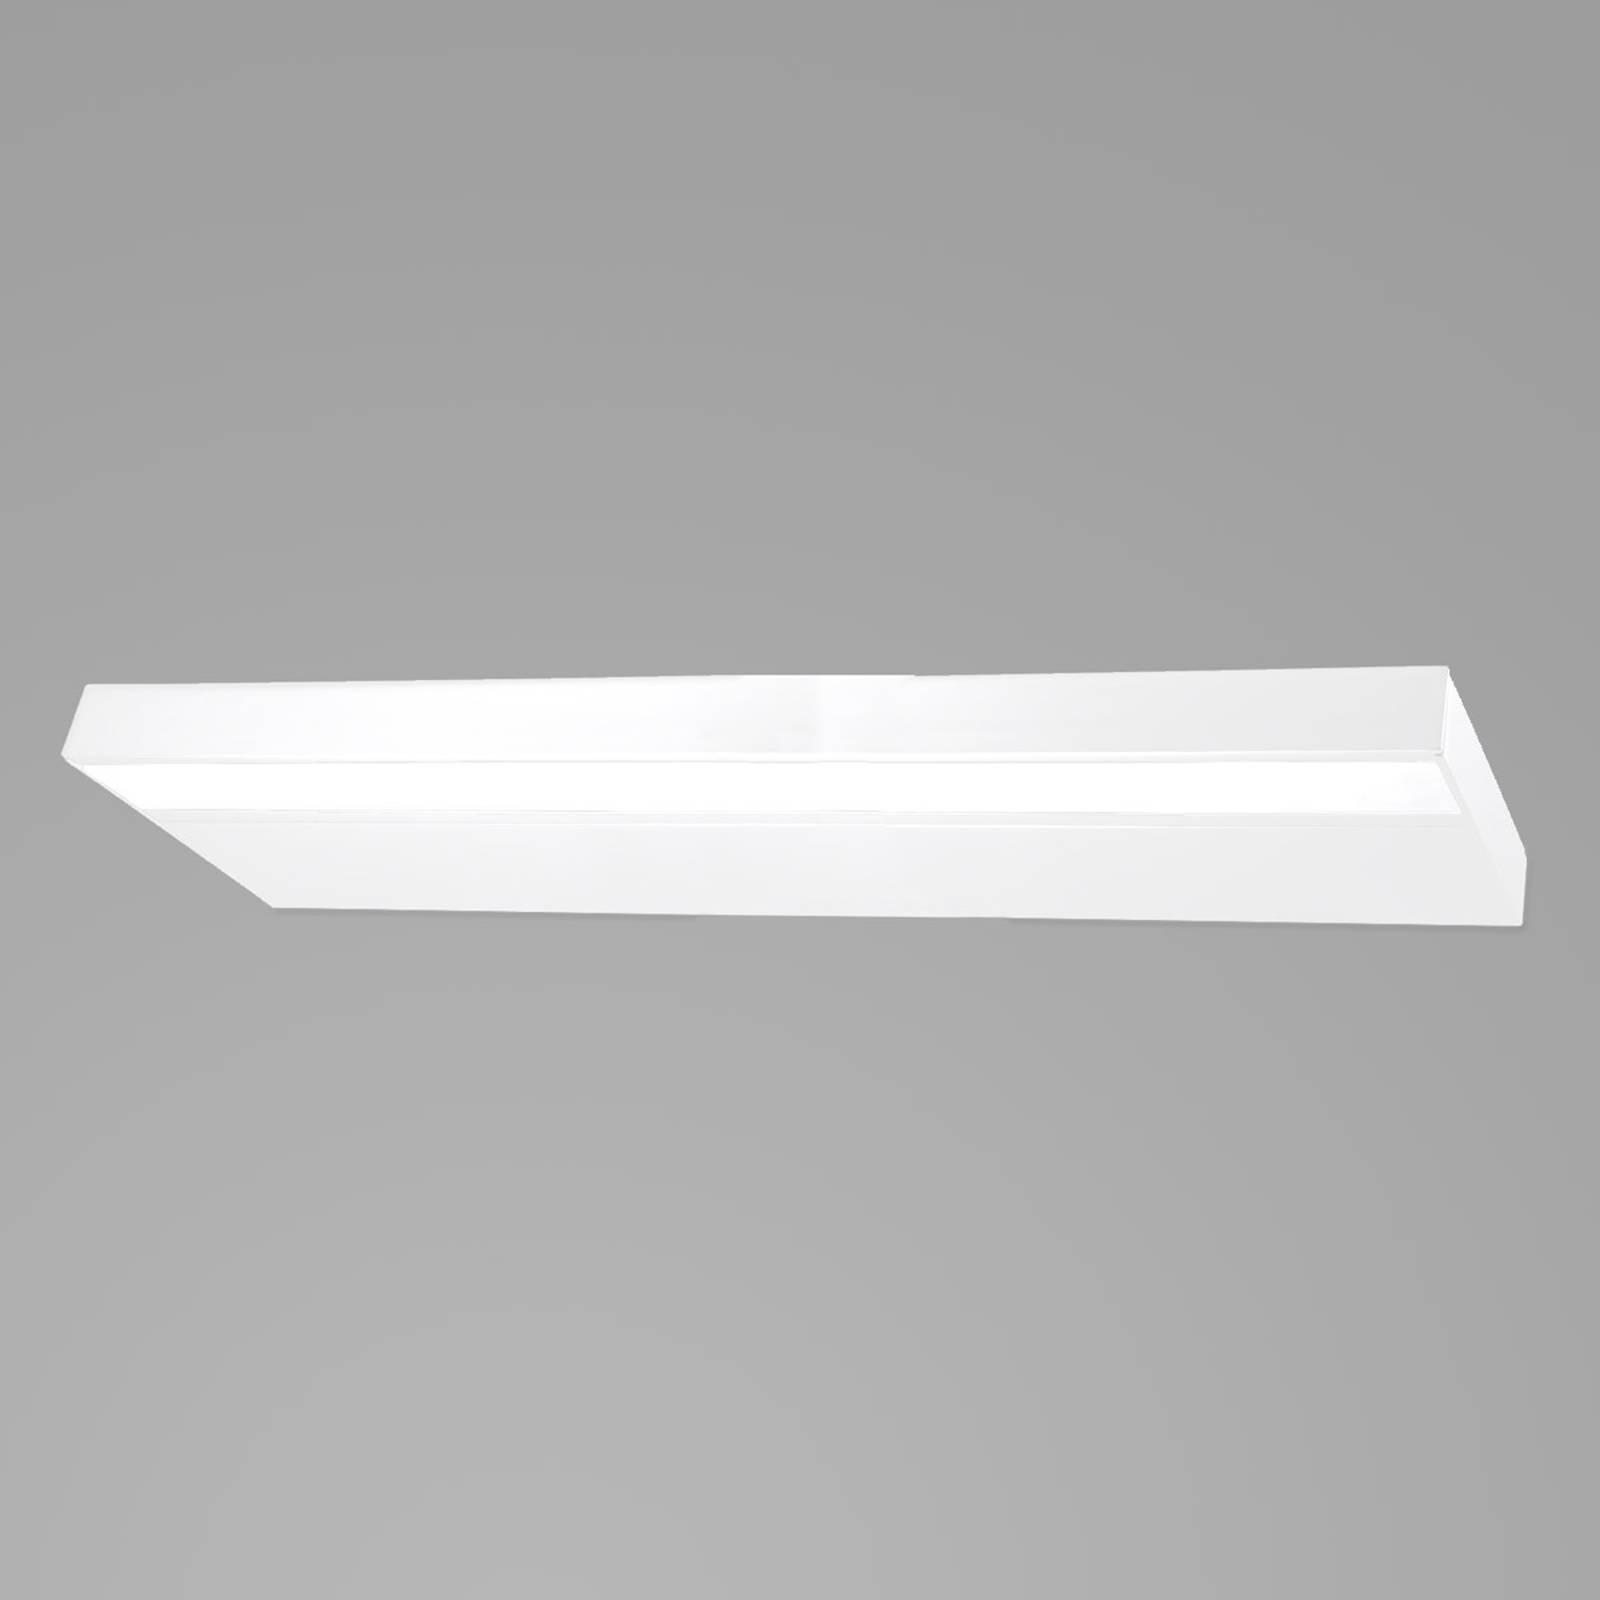 Applique salle de bain LED Prim IP20 90cm, blanc